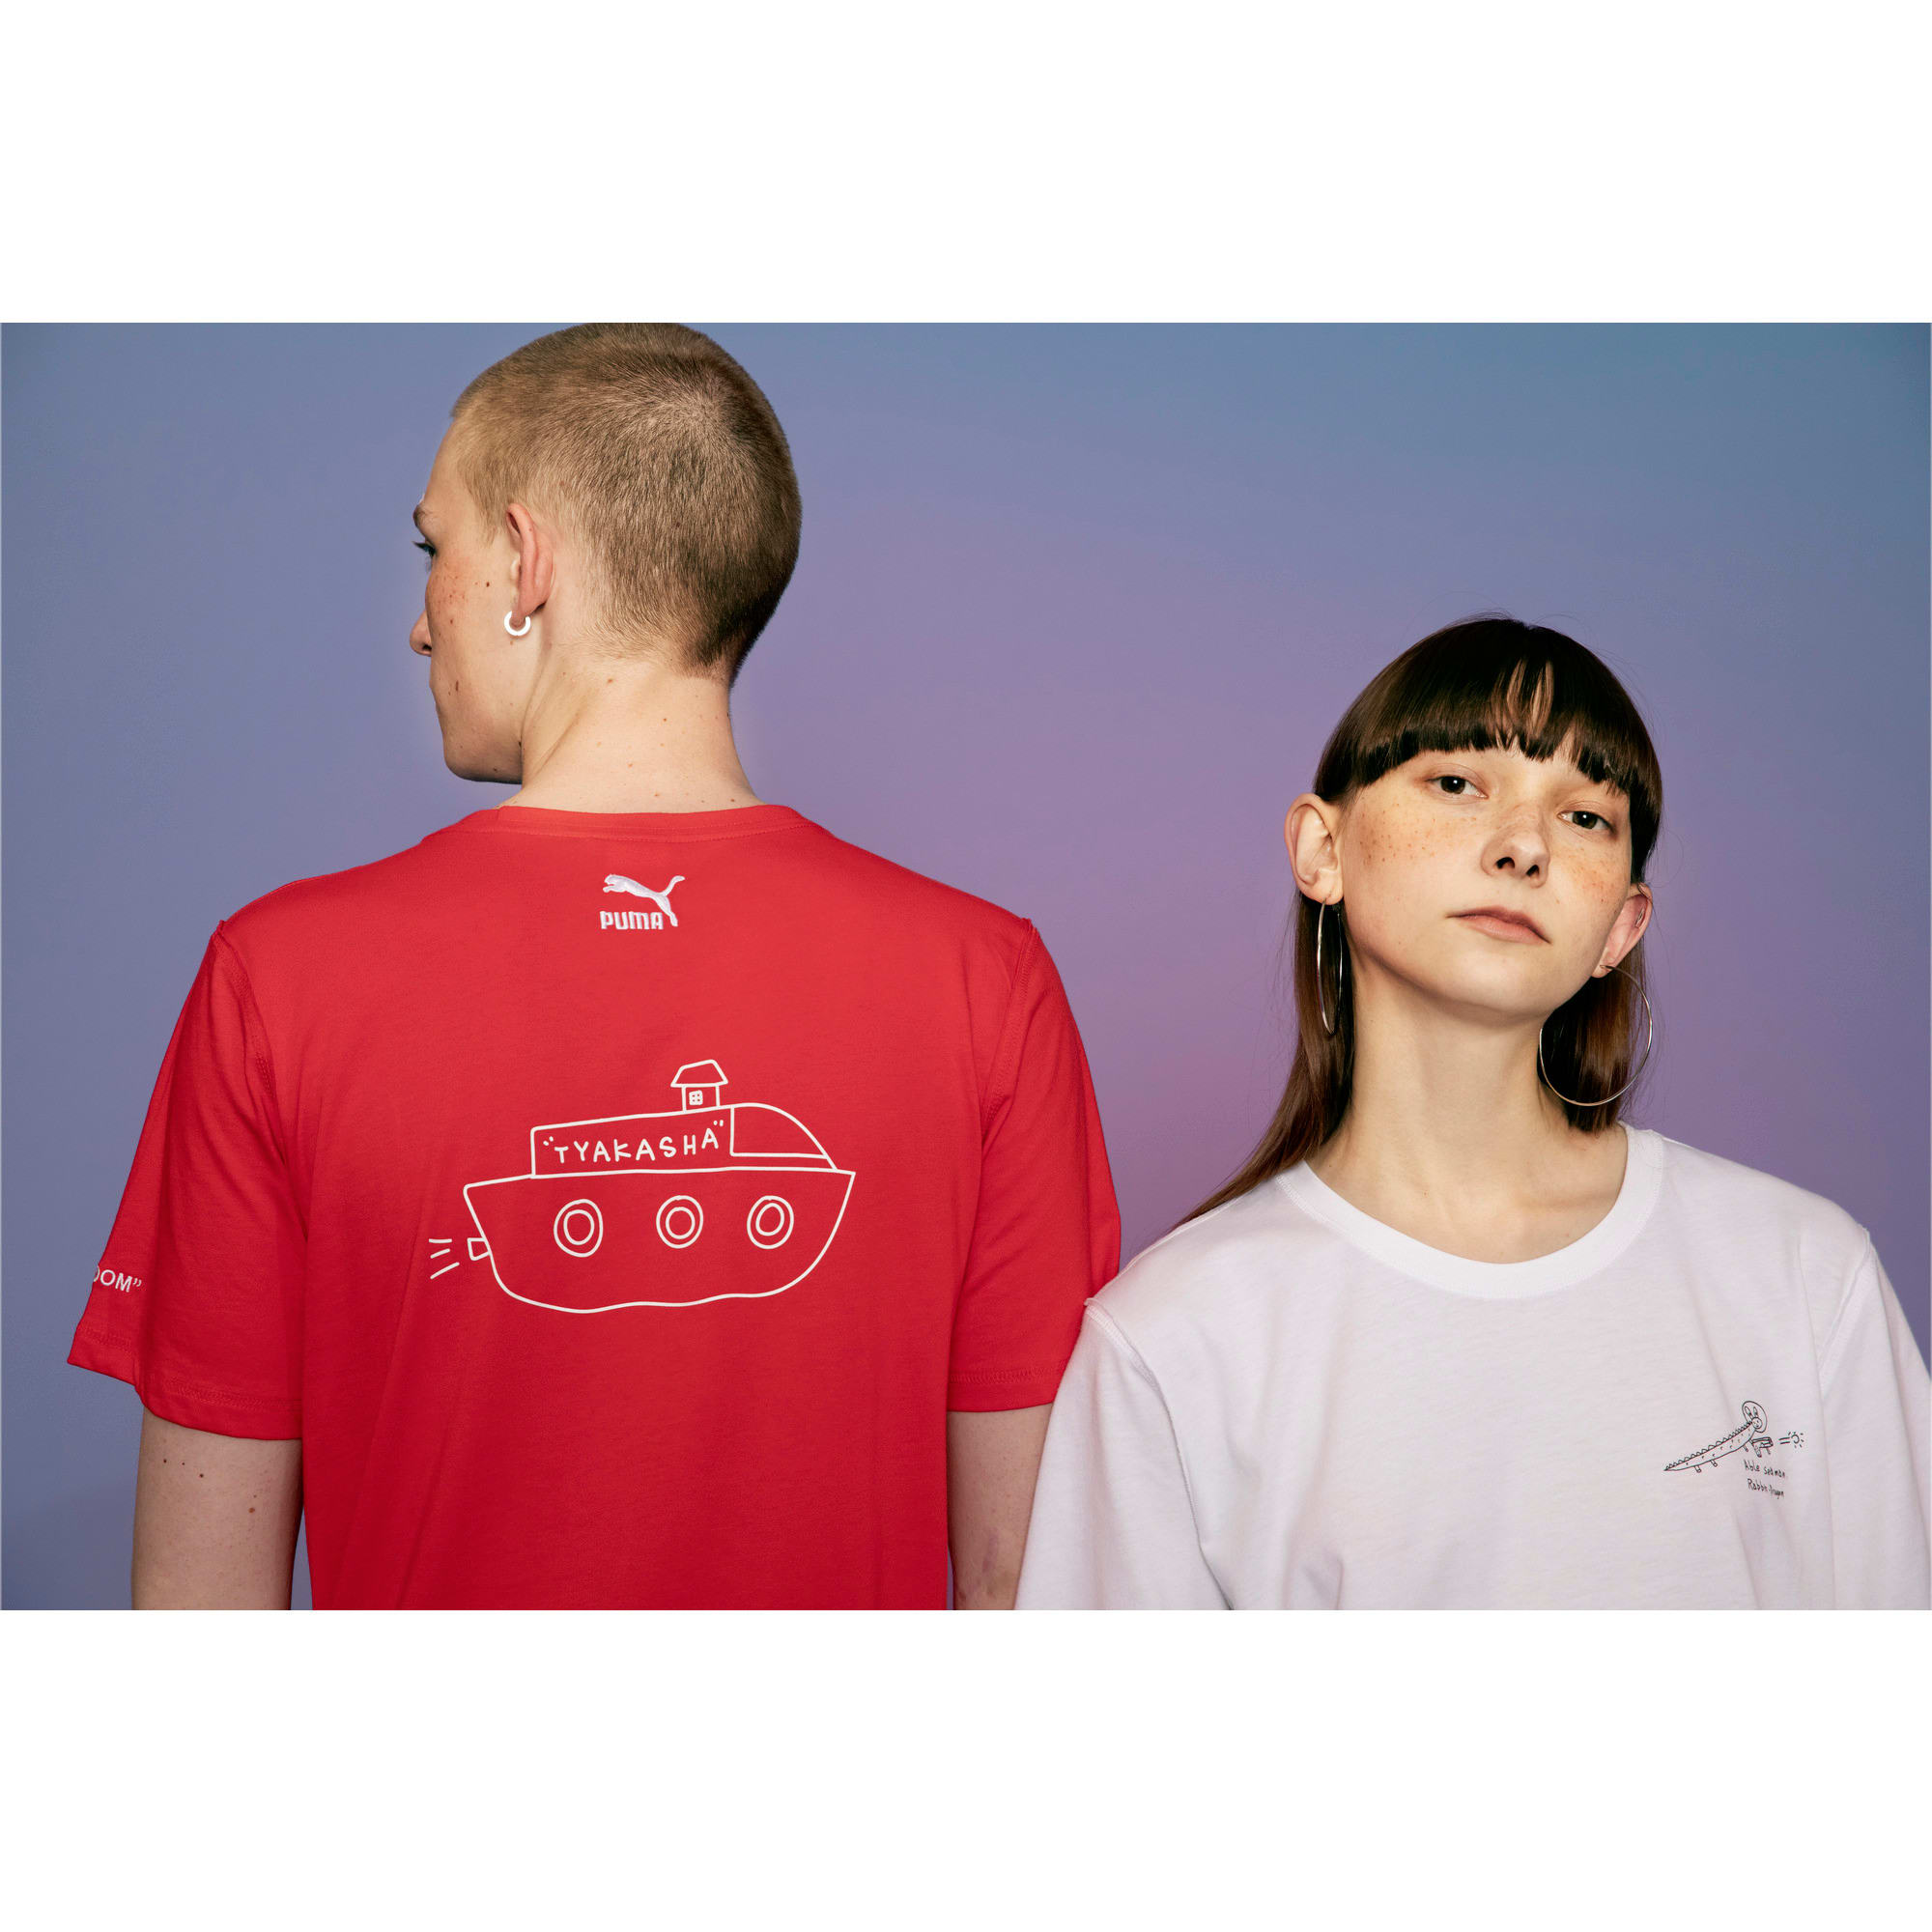 Thumbnail 6 of PUMA x TYAKASHA T-Shirt, High Risk Red, medium